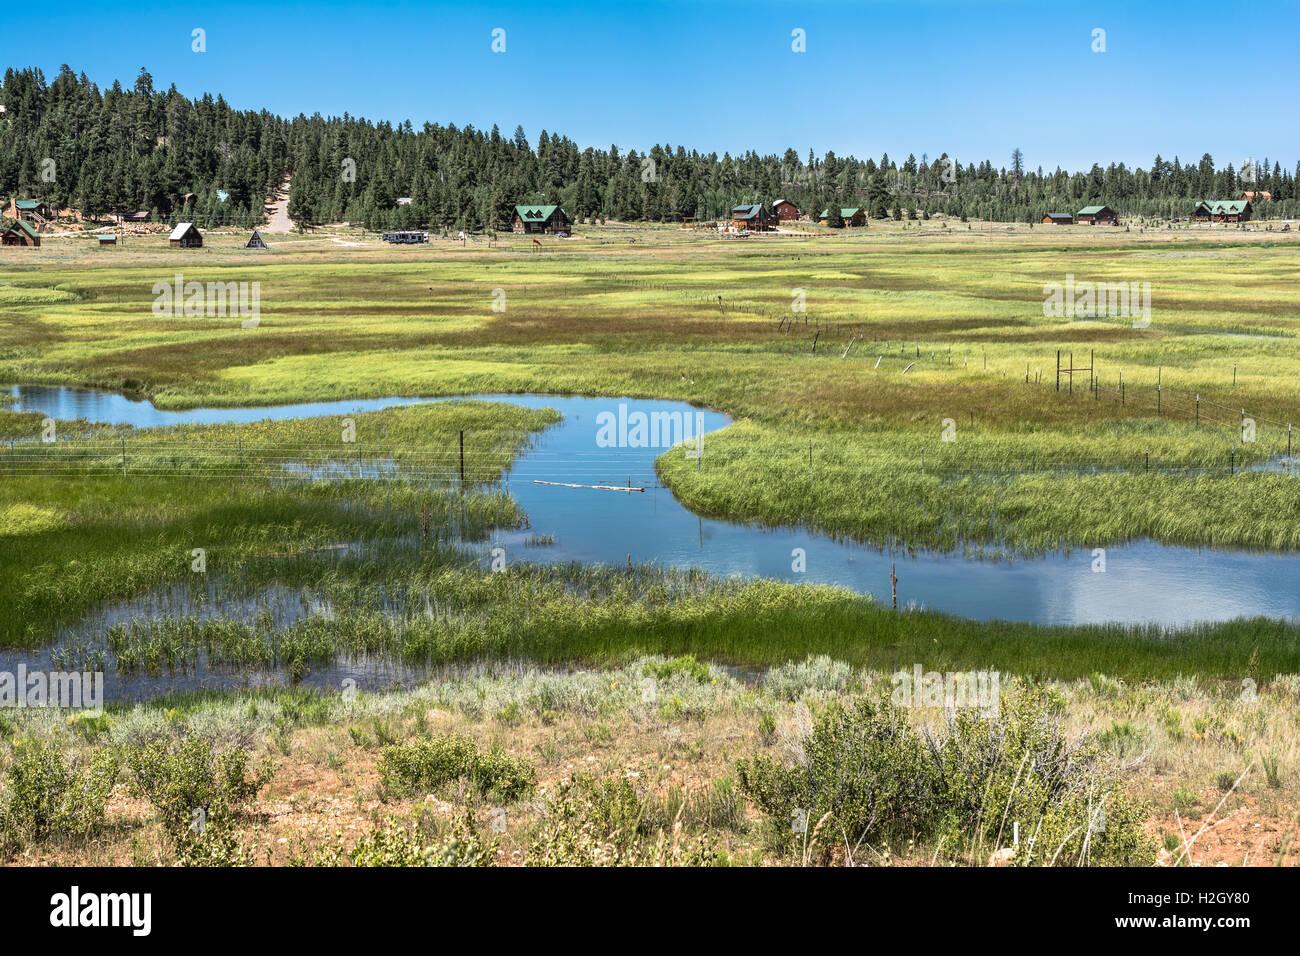 Duck Creek Village Utah >> Landscape Of Duck Creek Village Utah Stock Photo 122074512 Alamy